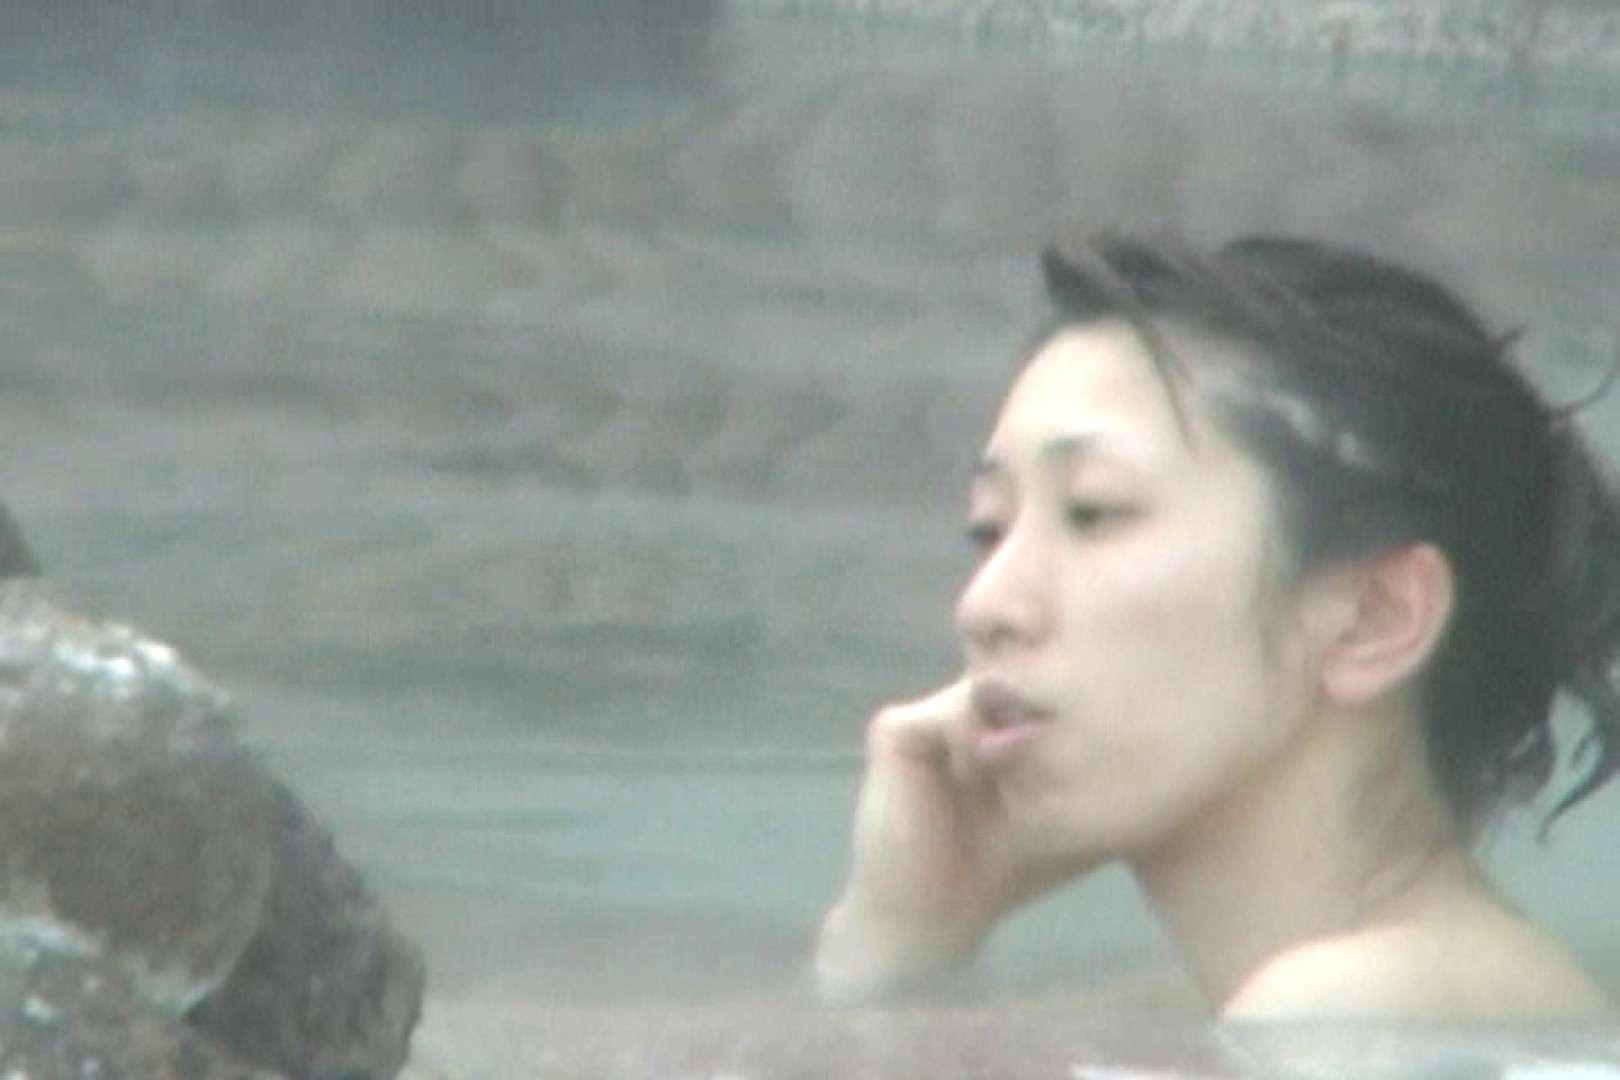 Aquaな露天風呂Vol.588 HなOL | 盗撮  66pic 27